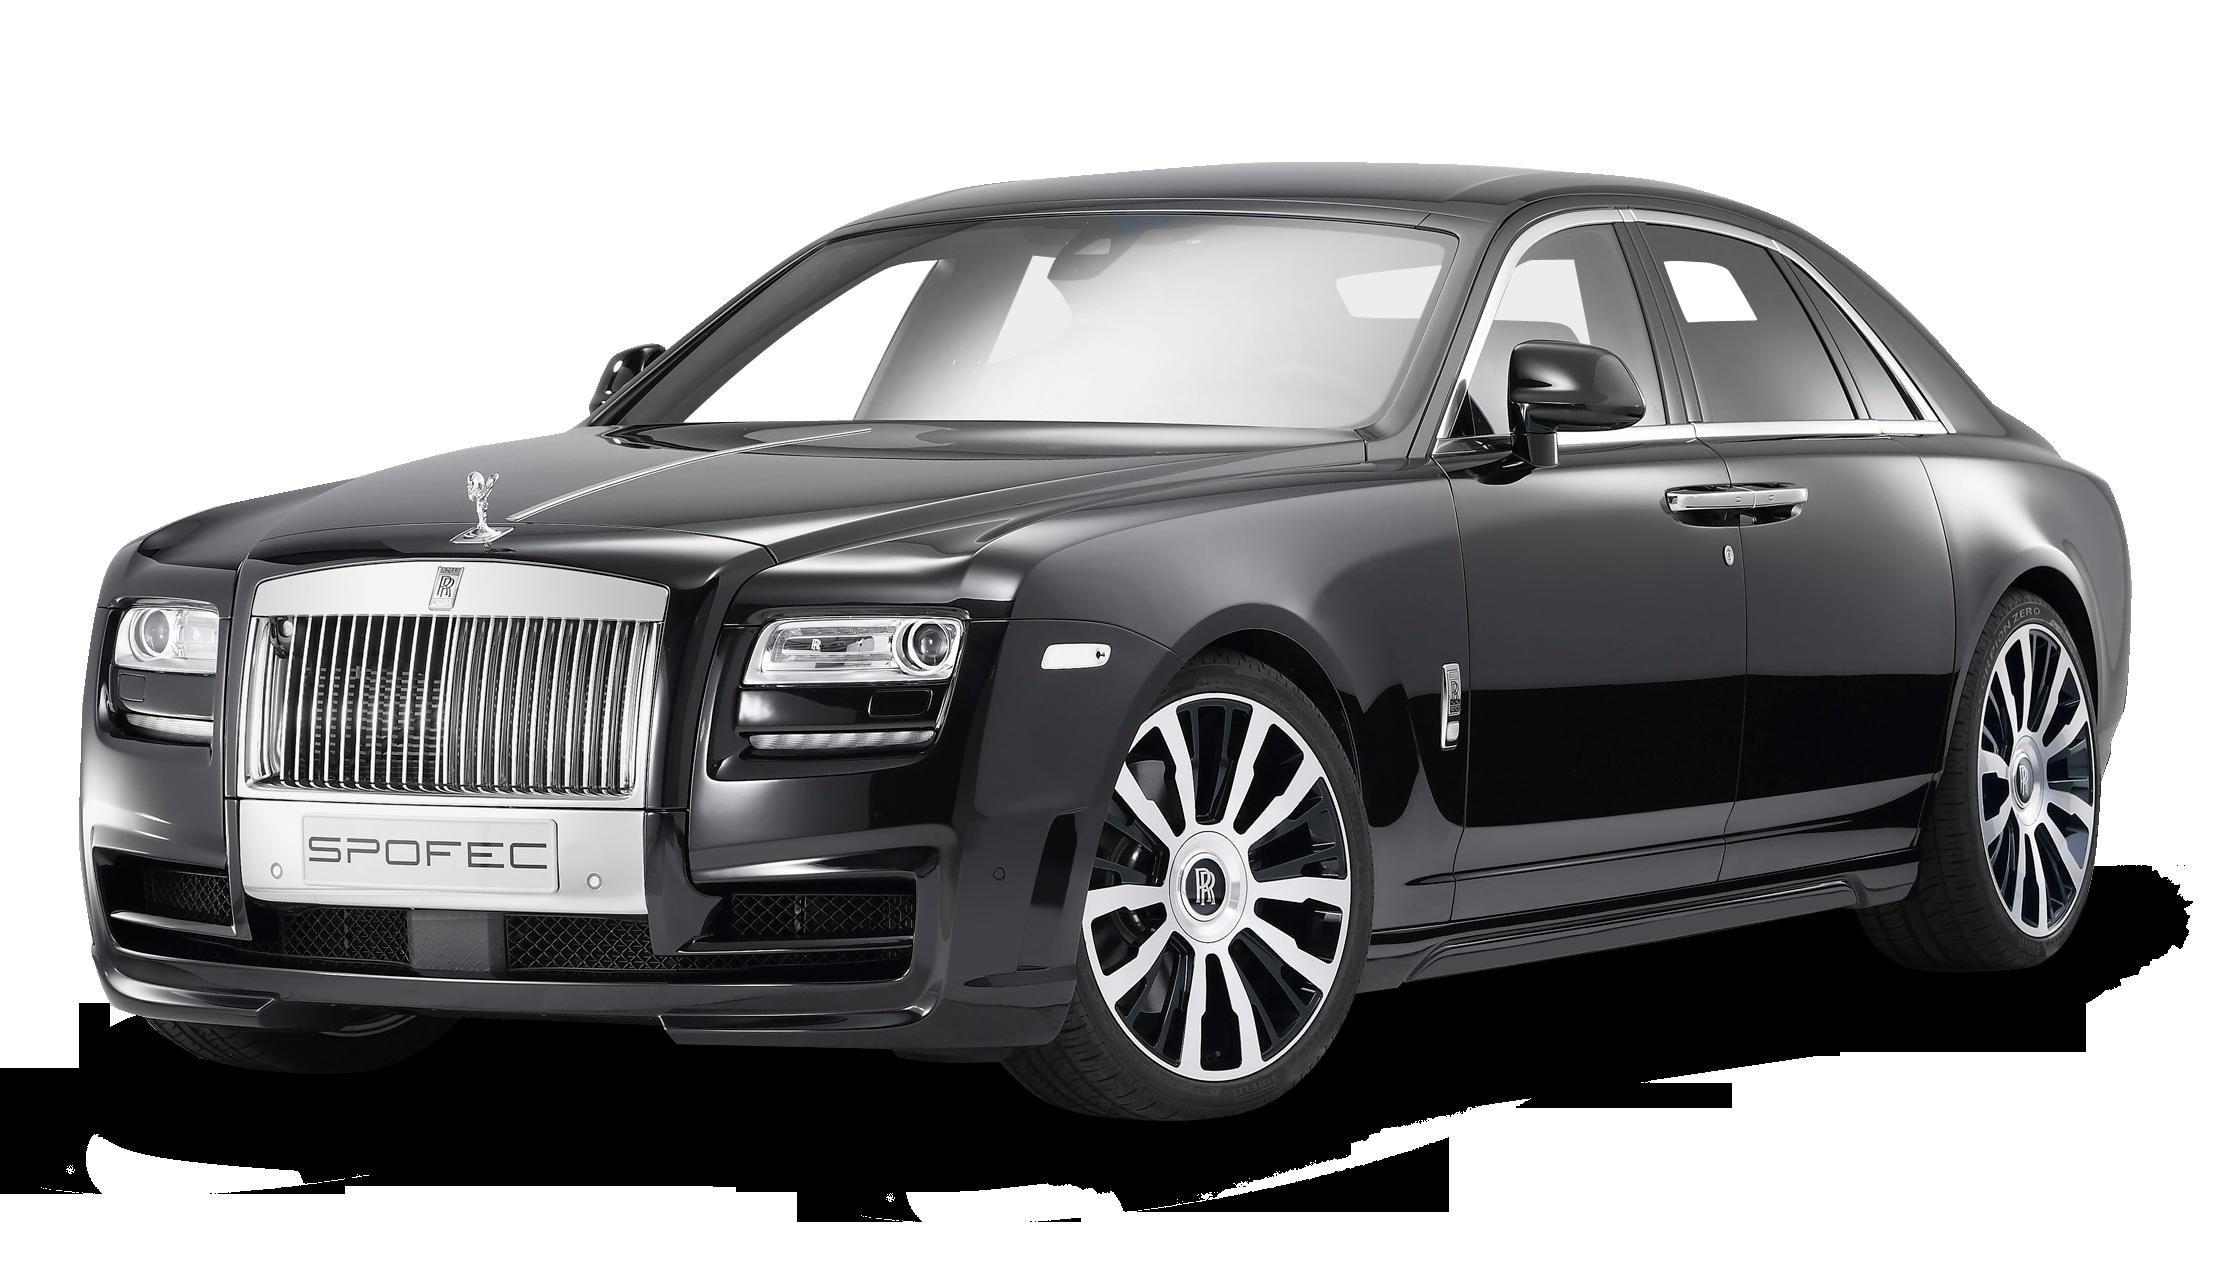 Rolls Royce Ghost Black Car Png Image Rolls Royce Ghost Black Rolls Royce Black Car